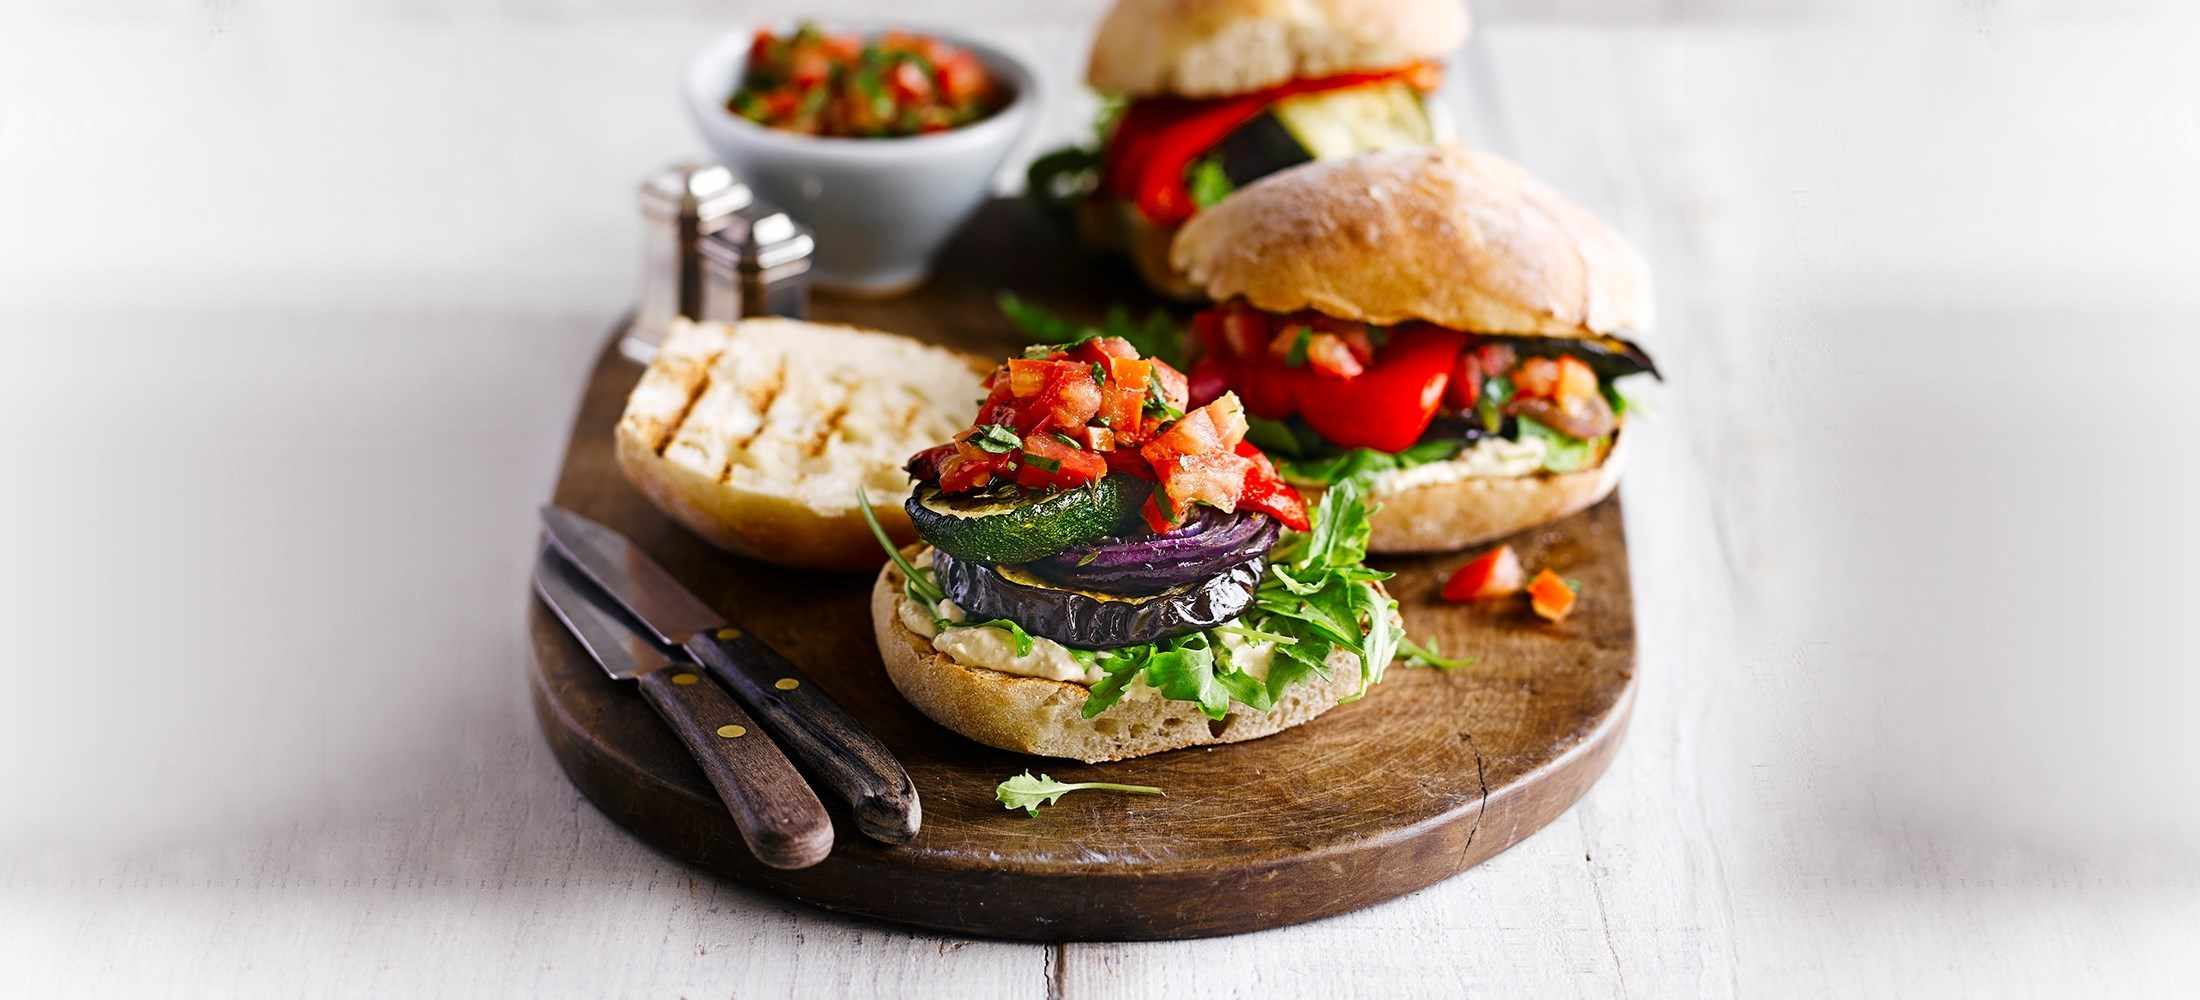 Quick vegetarian recipes ready in under 30 minutes - Allotment burgers